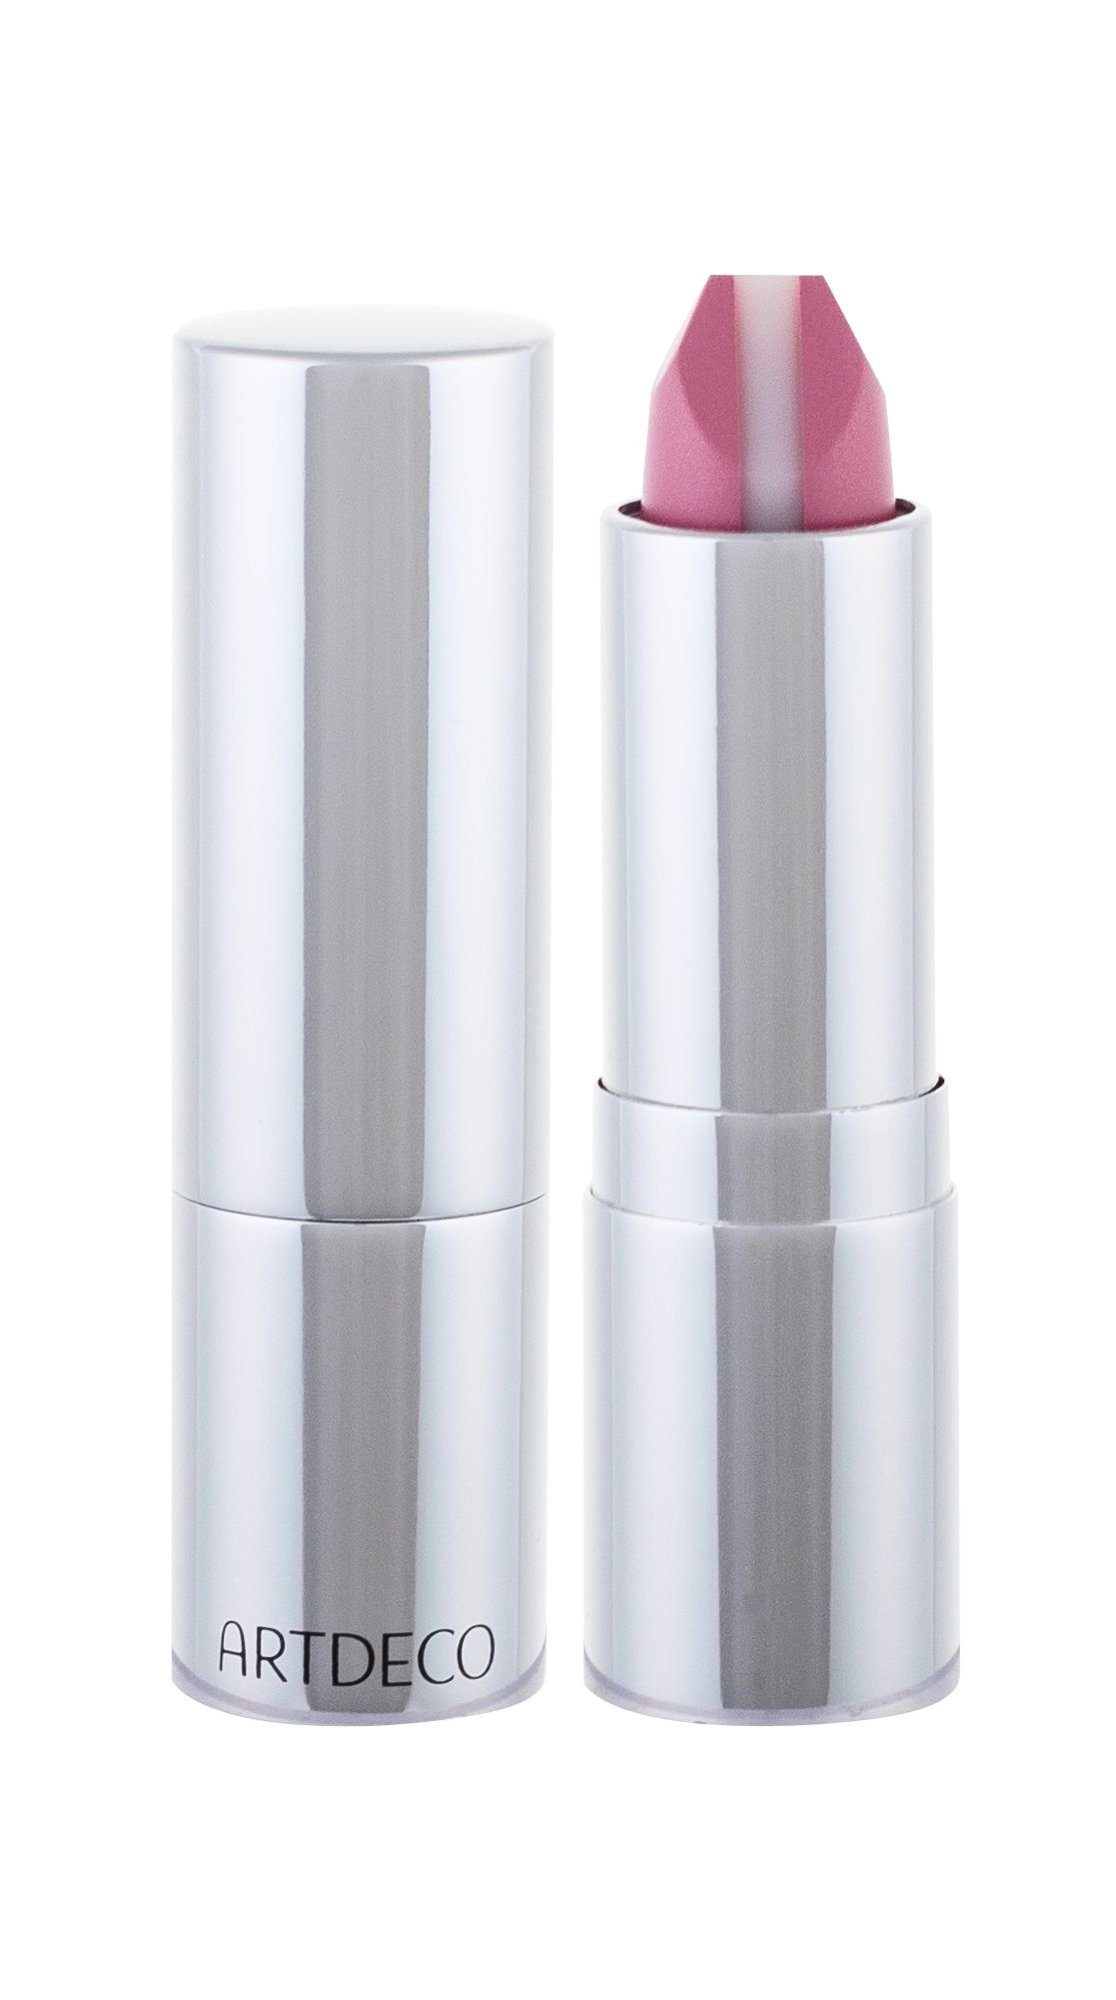 Artdeco Hydra Care Lipstick 3,5ml 02 Charming Oasis